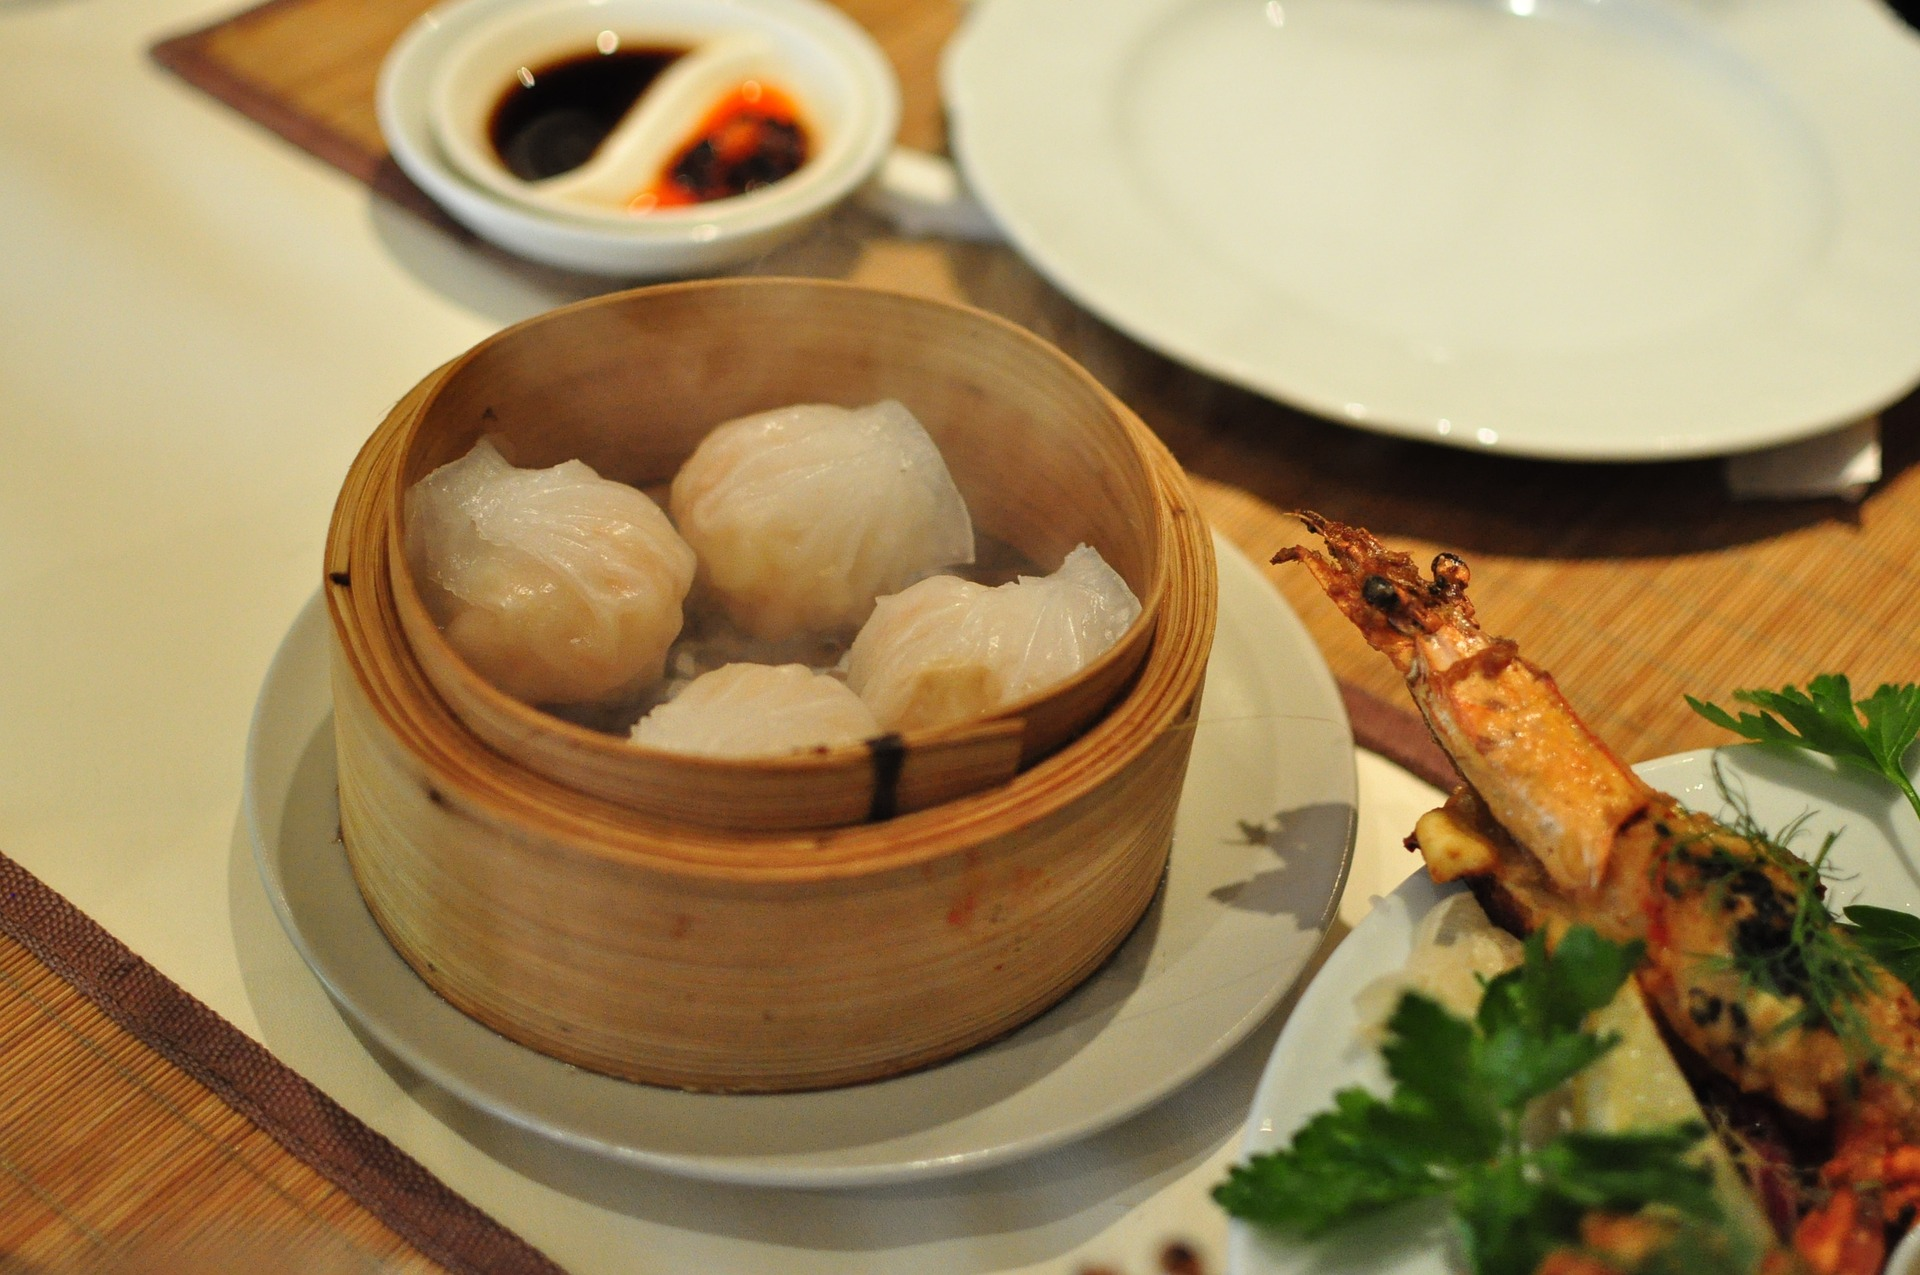 dumplings-1122153_1920.jpg